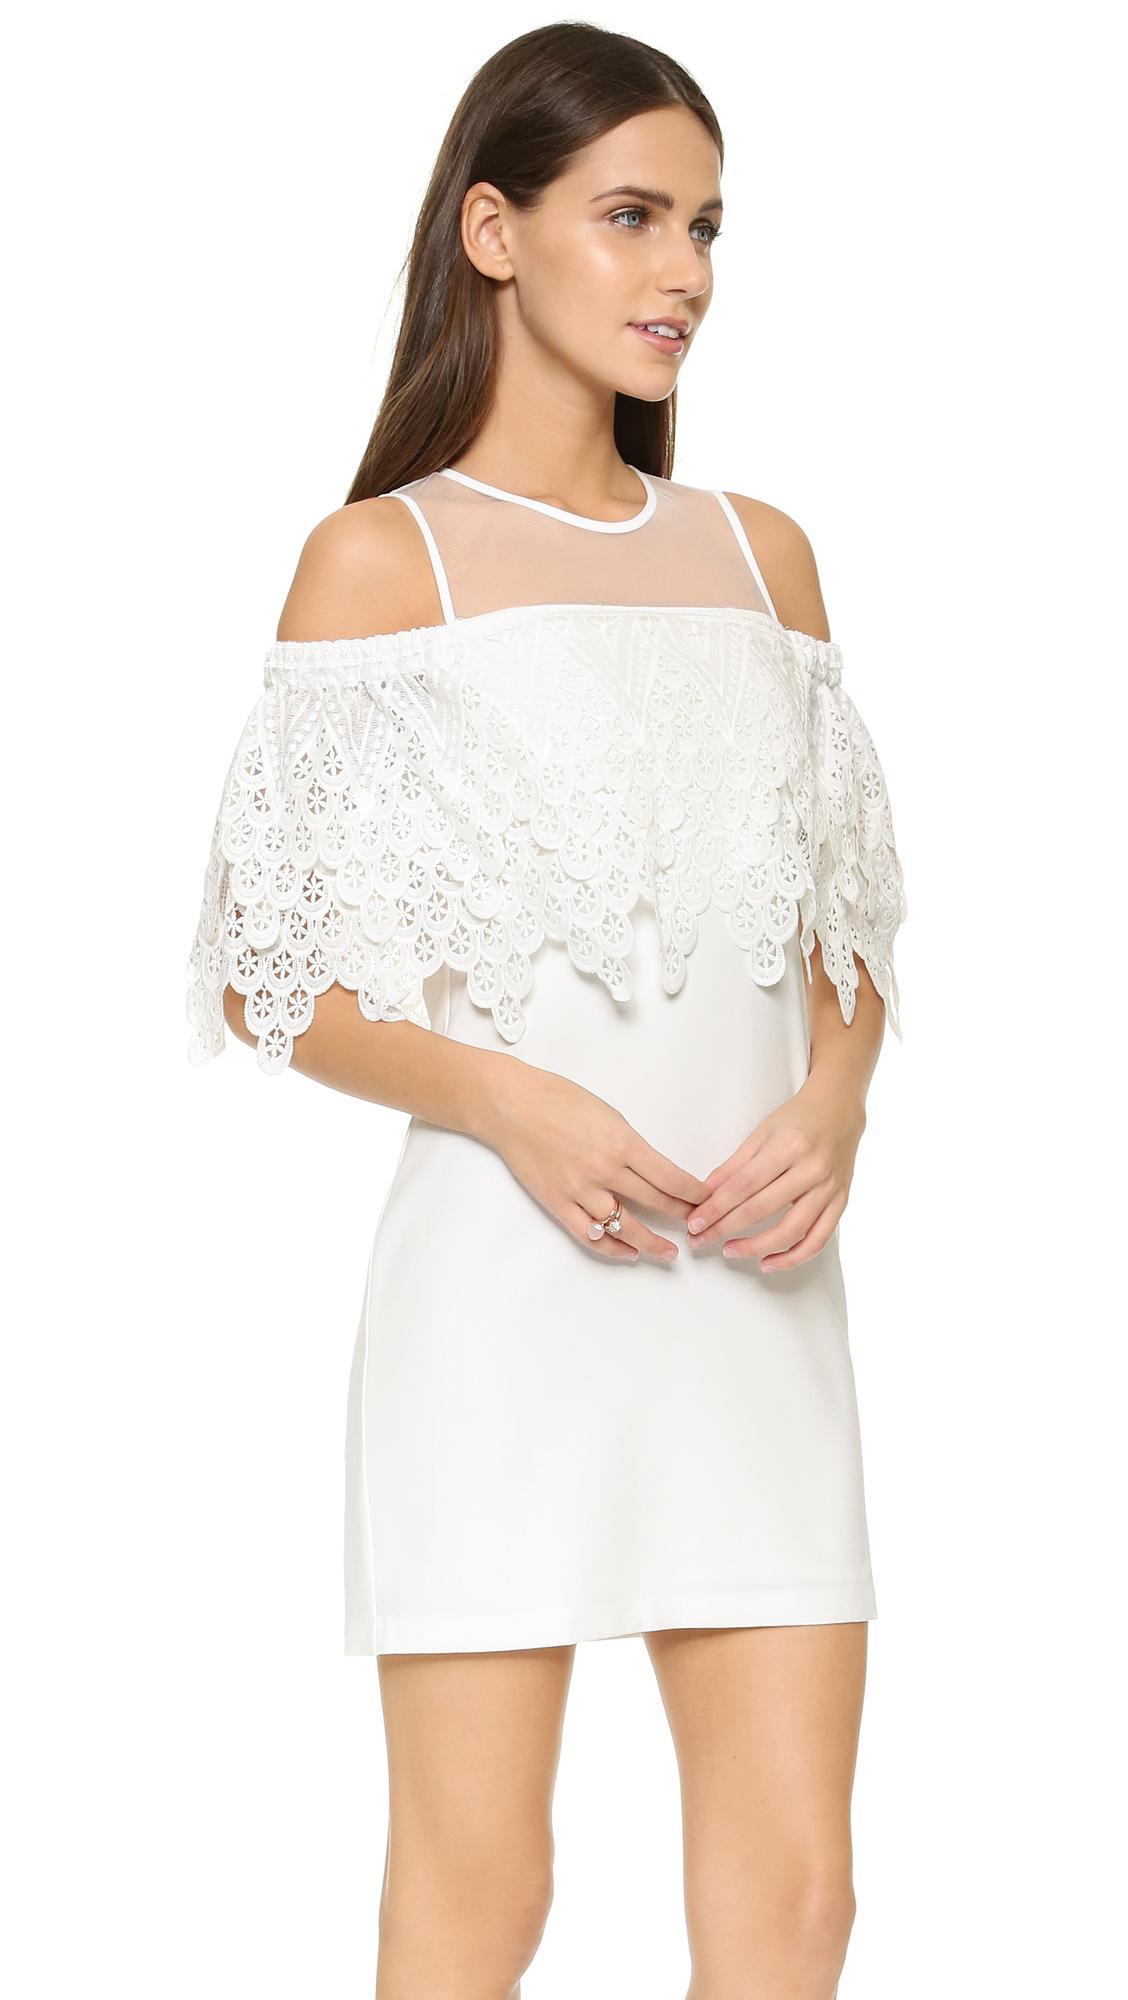 8b05c8fba2fe9 Lyst - Endless Rose Cold Shoulder Lace Mini Dress